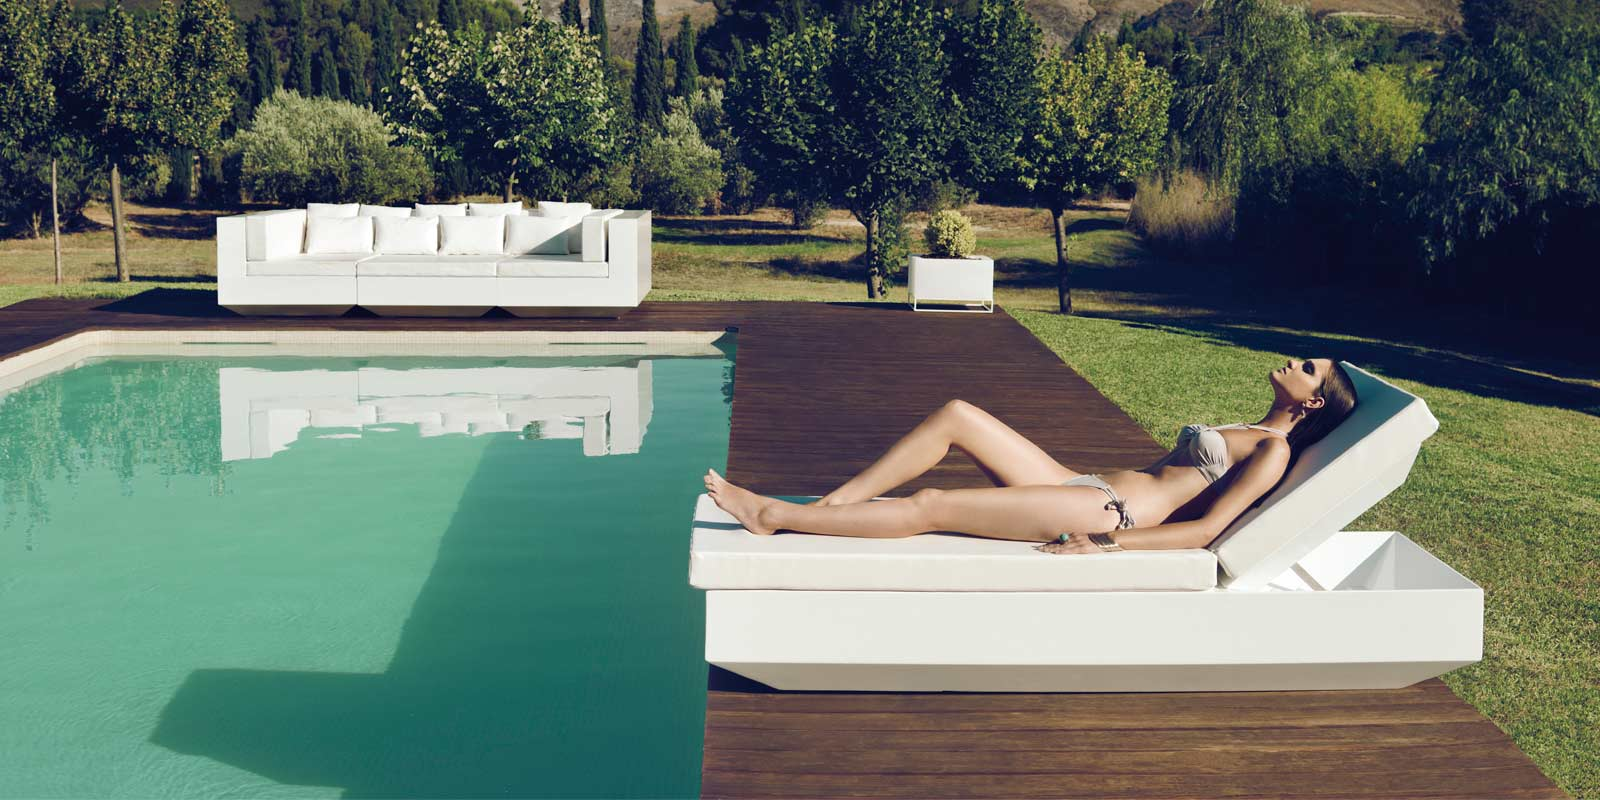 VONDOM-muebles-exterior-diseño-tumbona-sofa-vela-ramonesteve-vondom_(12)